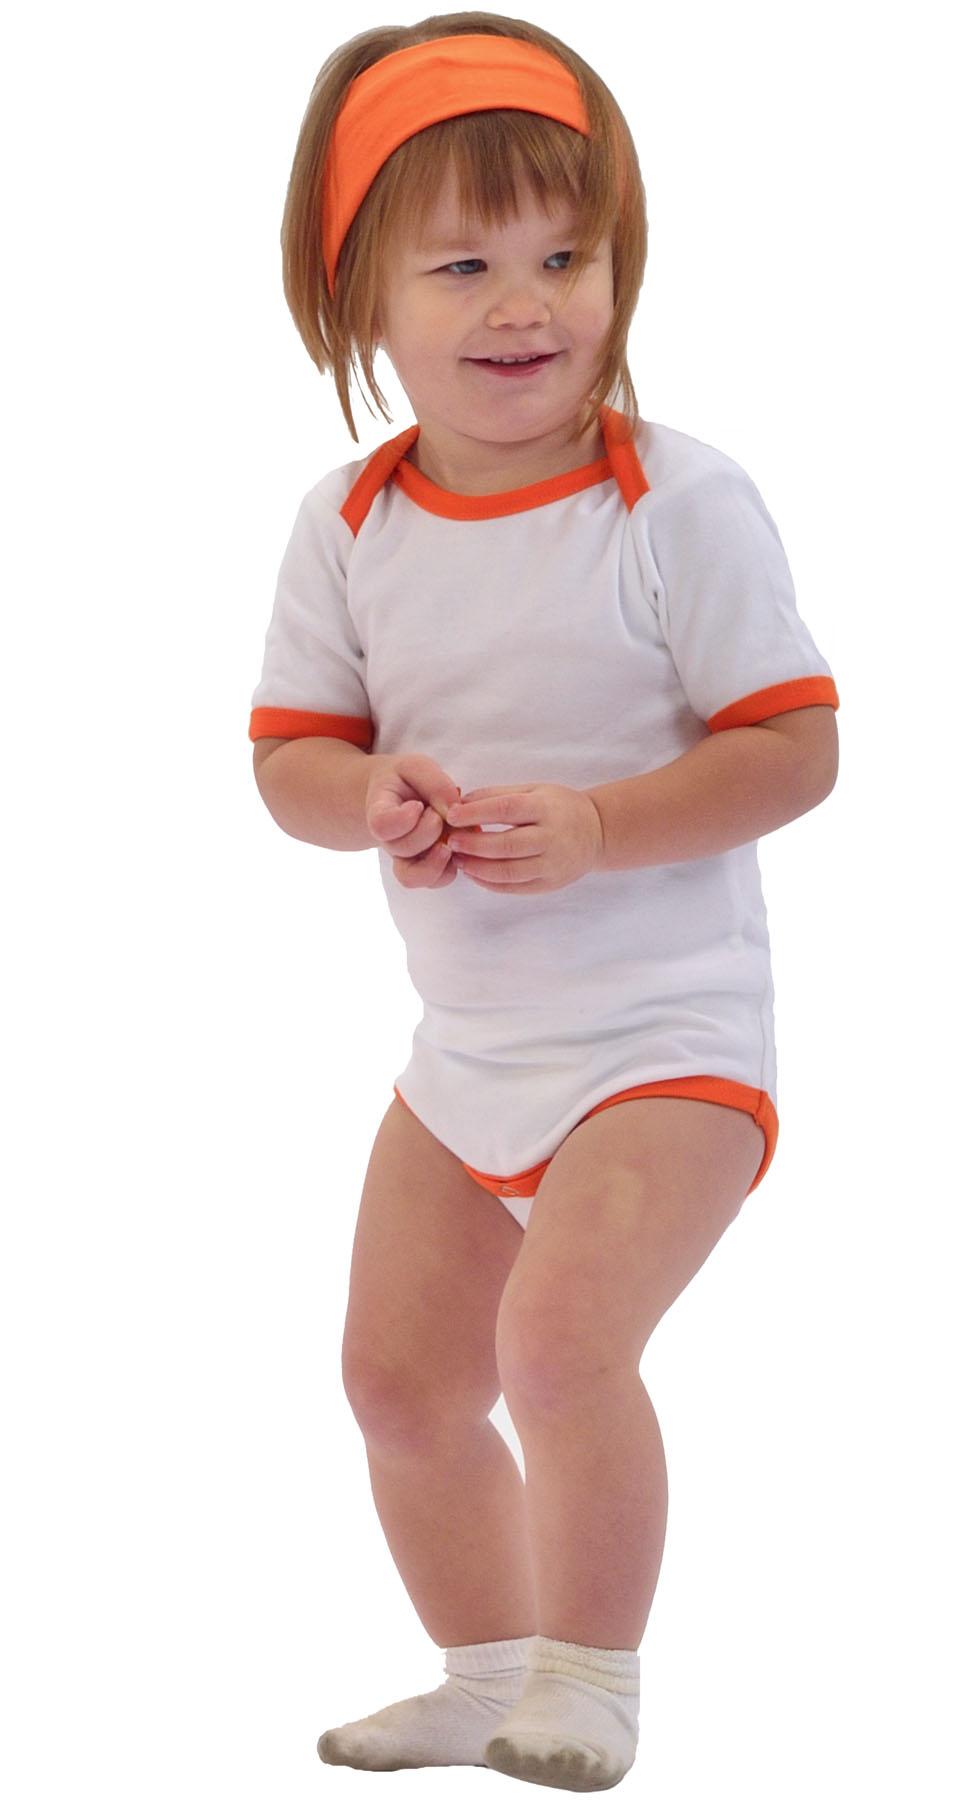 Monag 100070 连锁边短袖撞色滚边纯色T恤一片式连体T恤